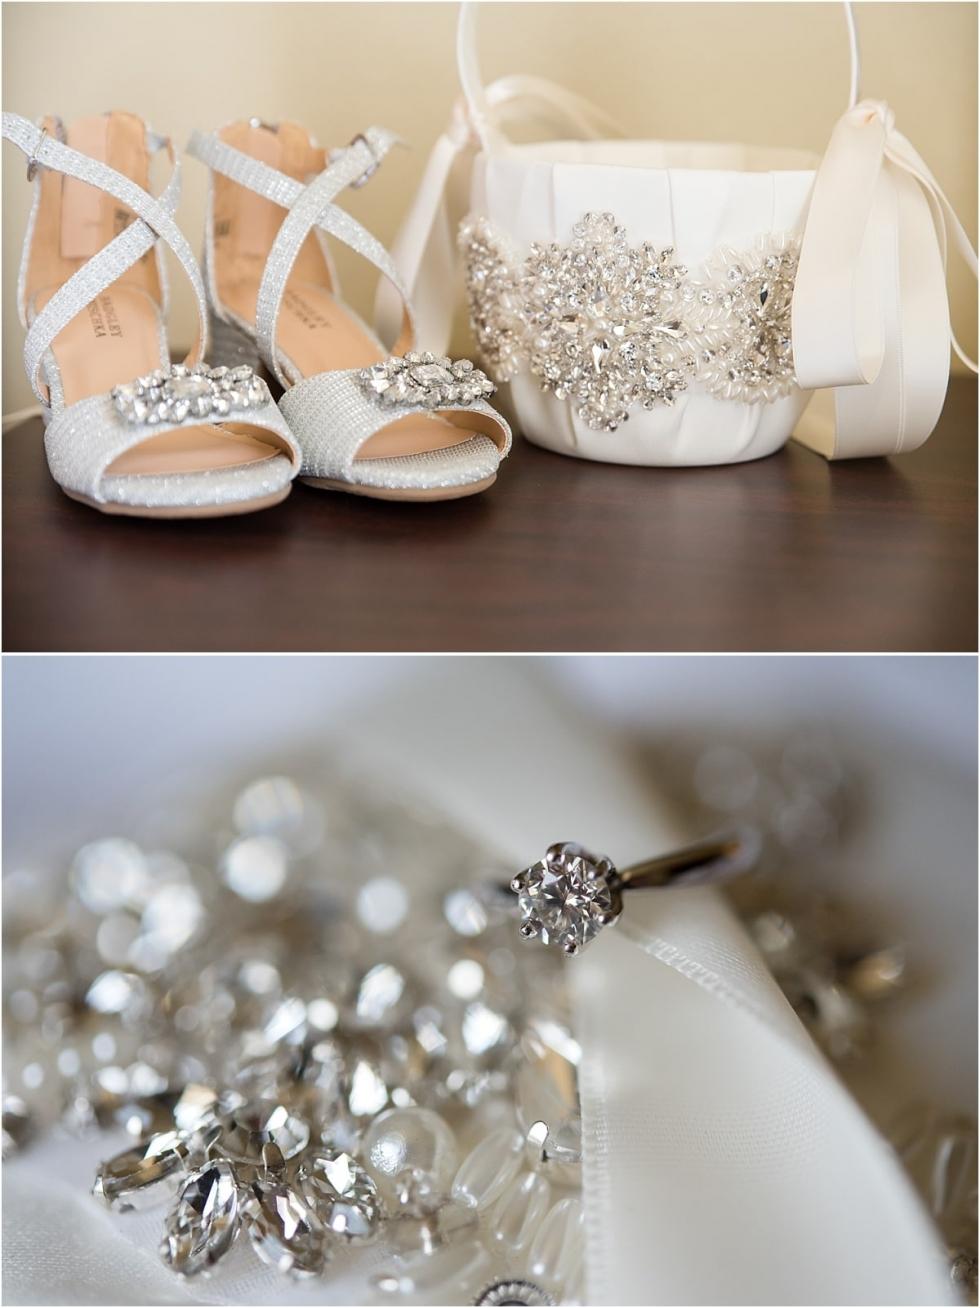 Bridal detail shots for old economy village wedding in Ambridge.